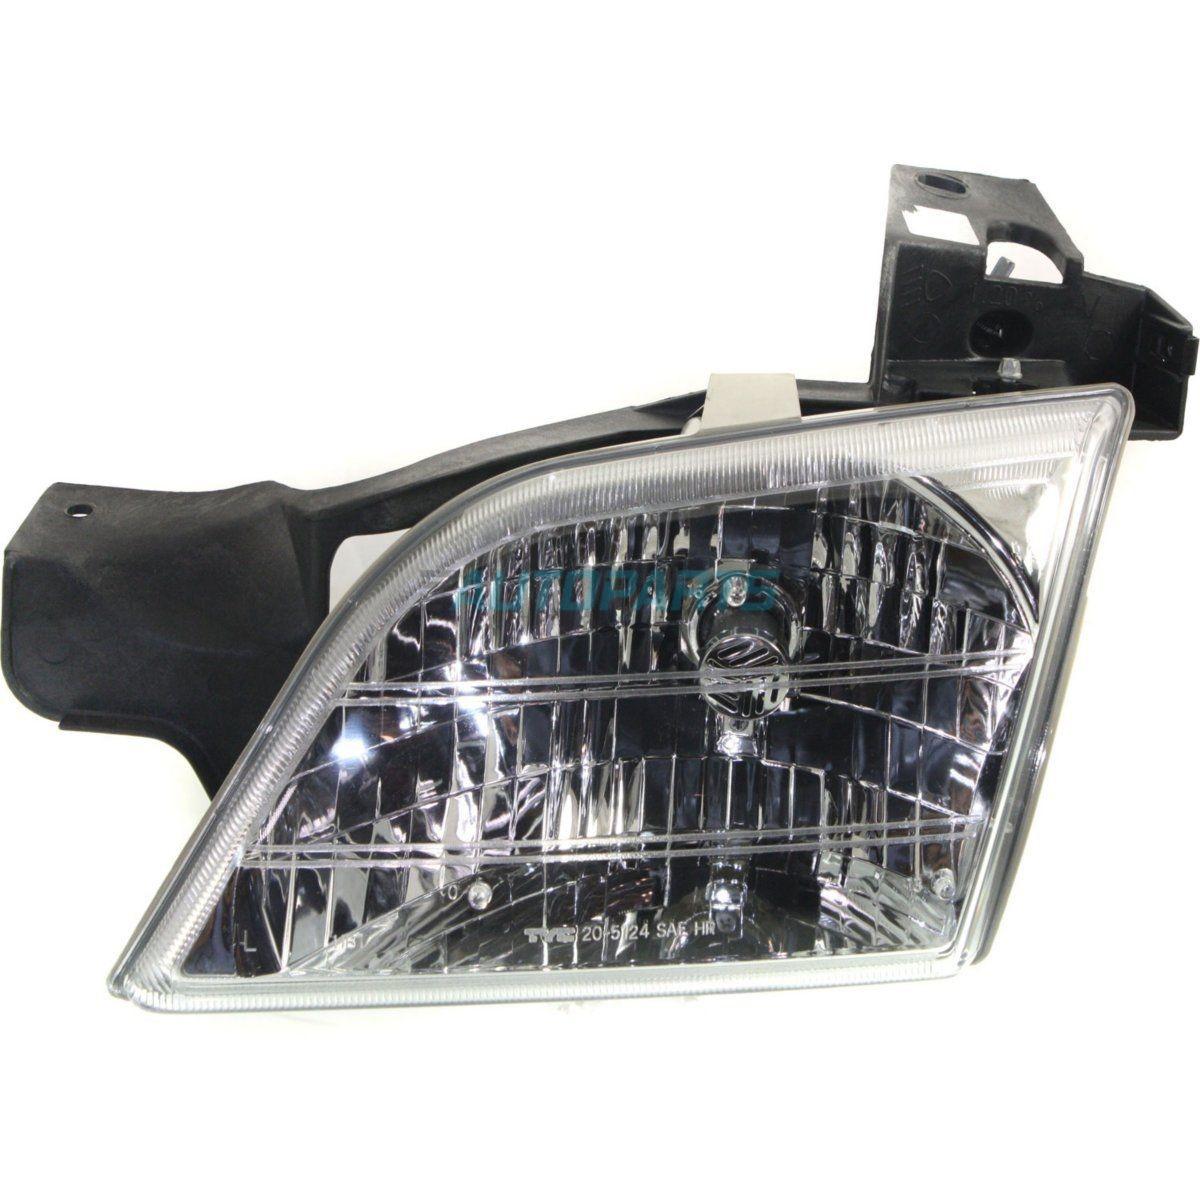 1997 Chevrolet Venture Passenger Transmission: NEW LEFT HALOGEN HEAD LAMP ASSEMBLY FITS 1997-2005